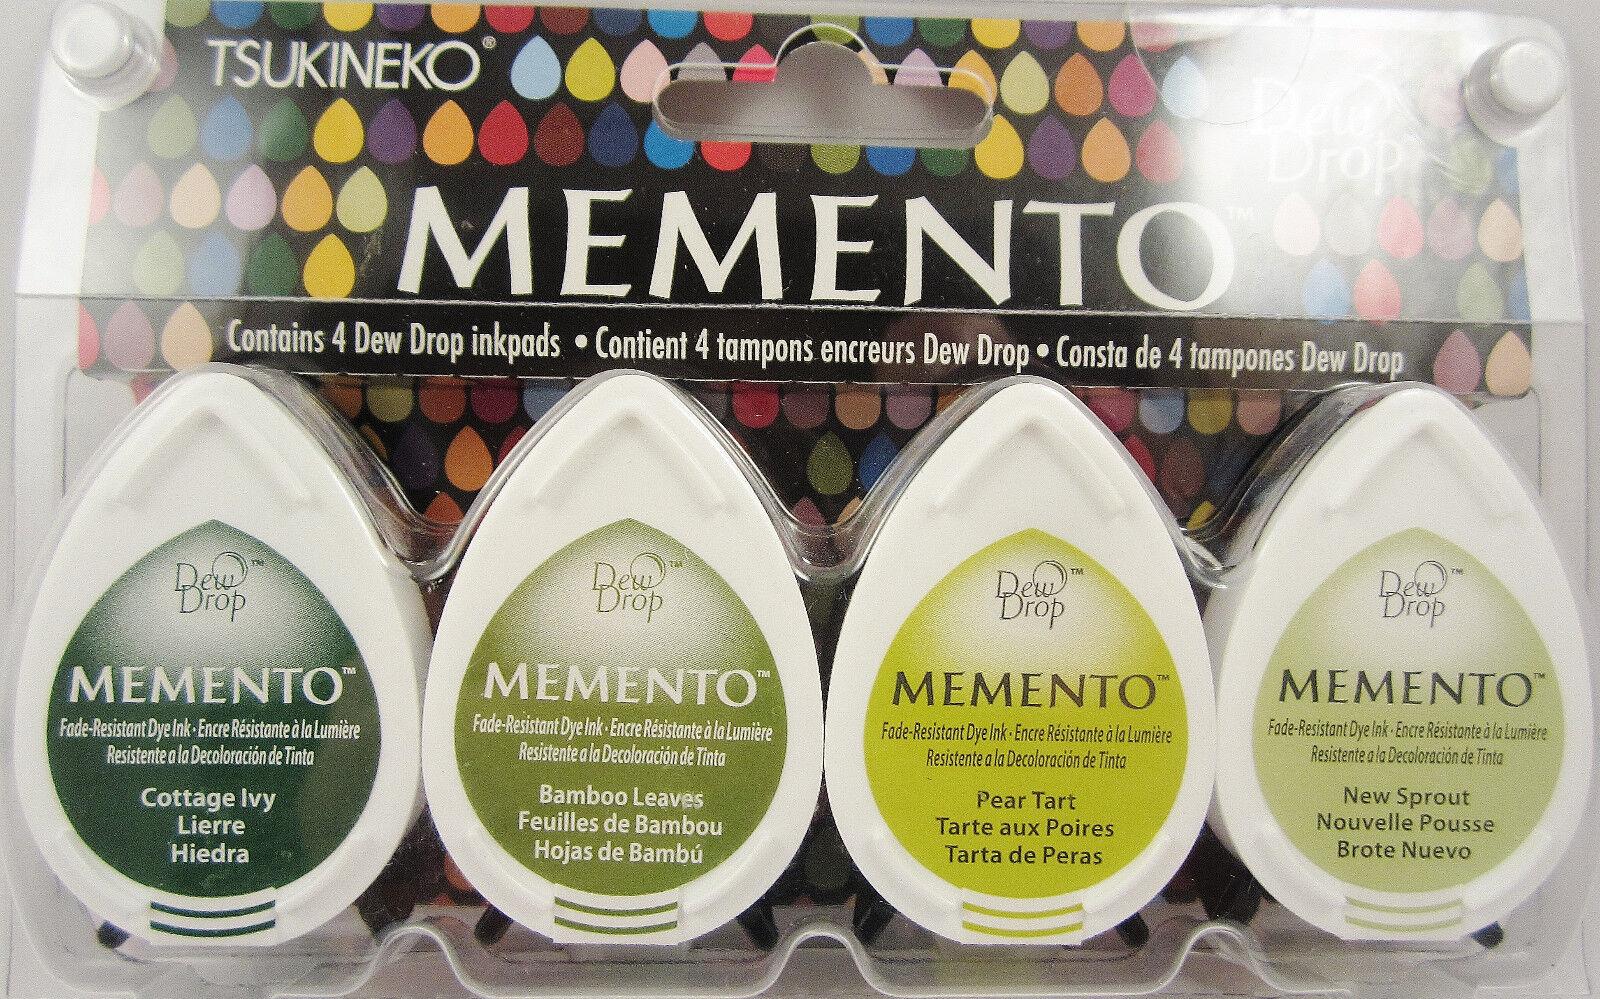 Tsukneko Memento Dew Drop Inkpads 4 Pack Your Choice